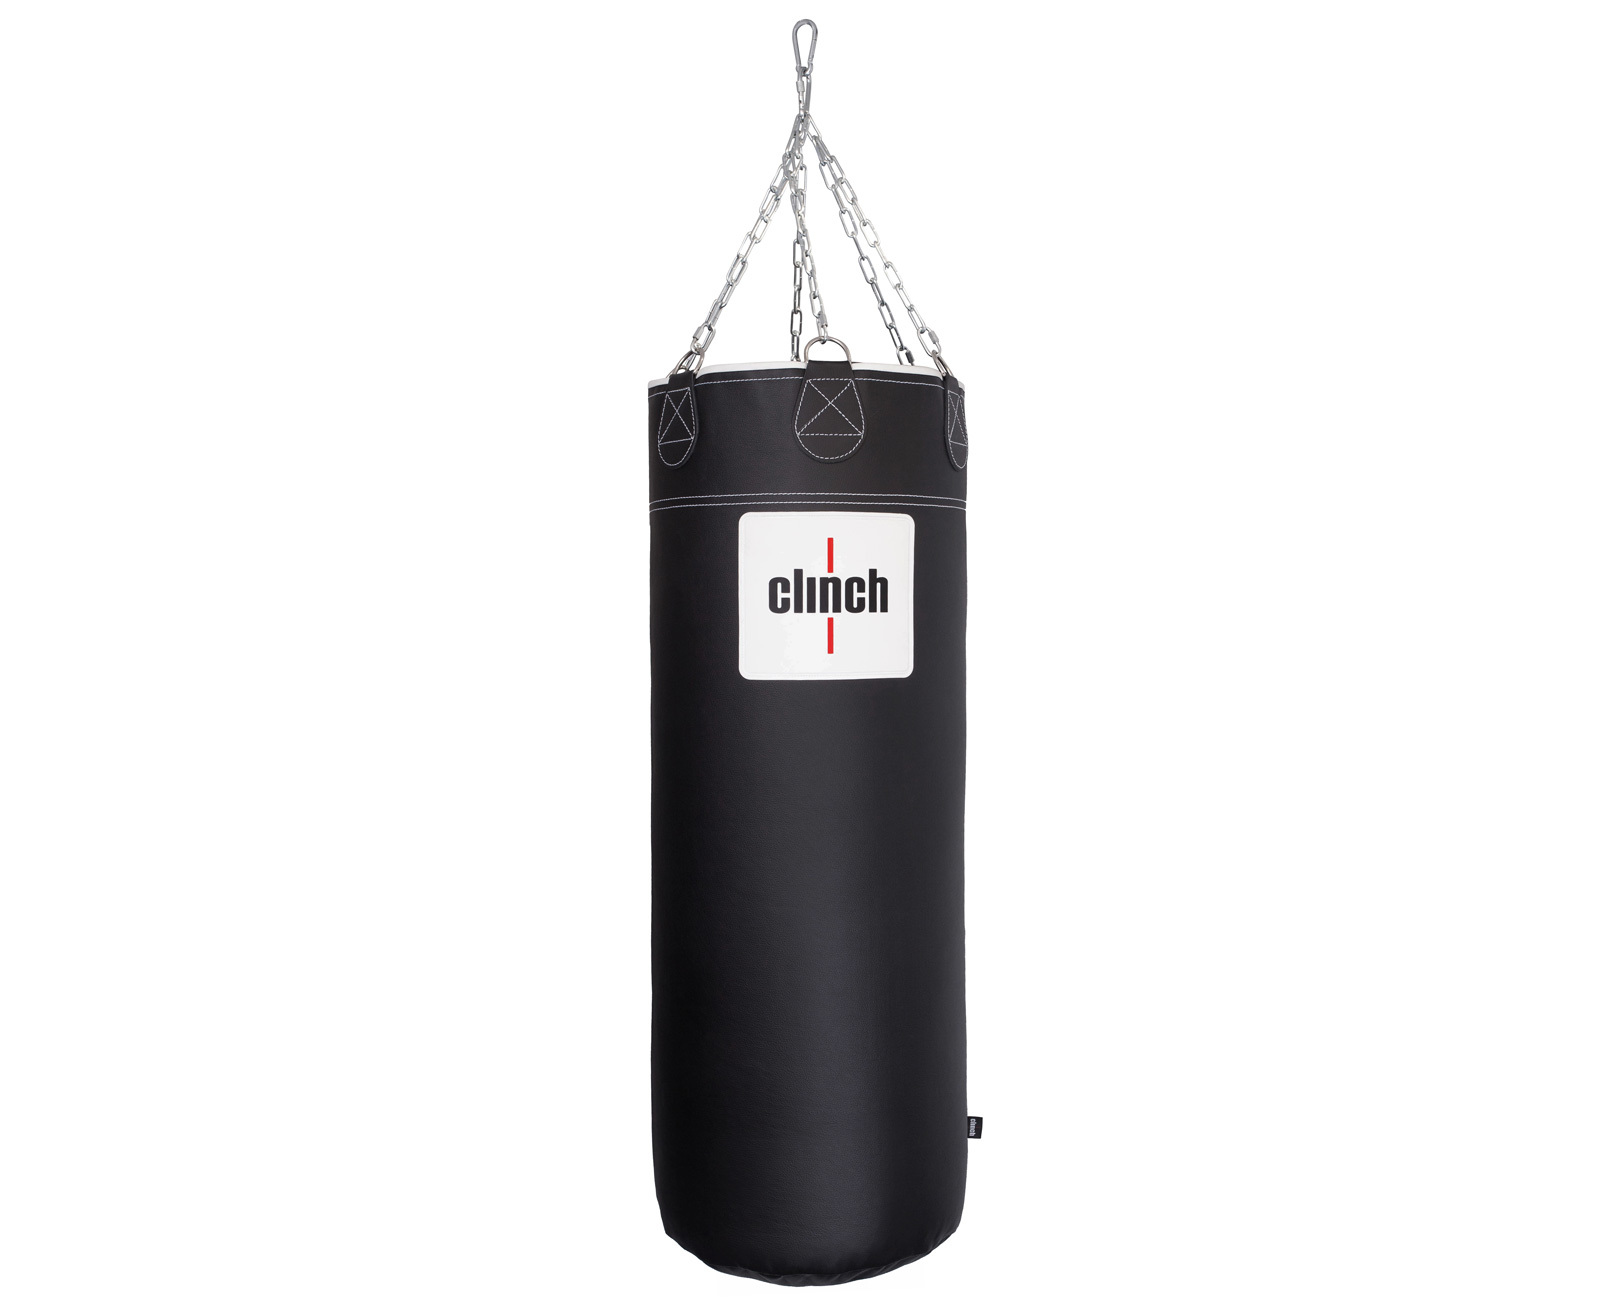 Боксерские мешки/груши МЕШОК БОКСЕРСКИЙ CLINCH PROFI & DURABLE meshok_bokserskiy_clinch_profi_durable120x45_sm_chernyy.jpg